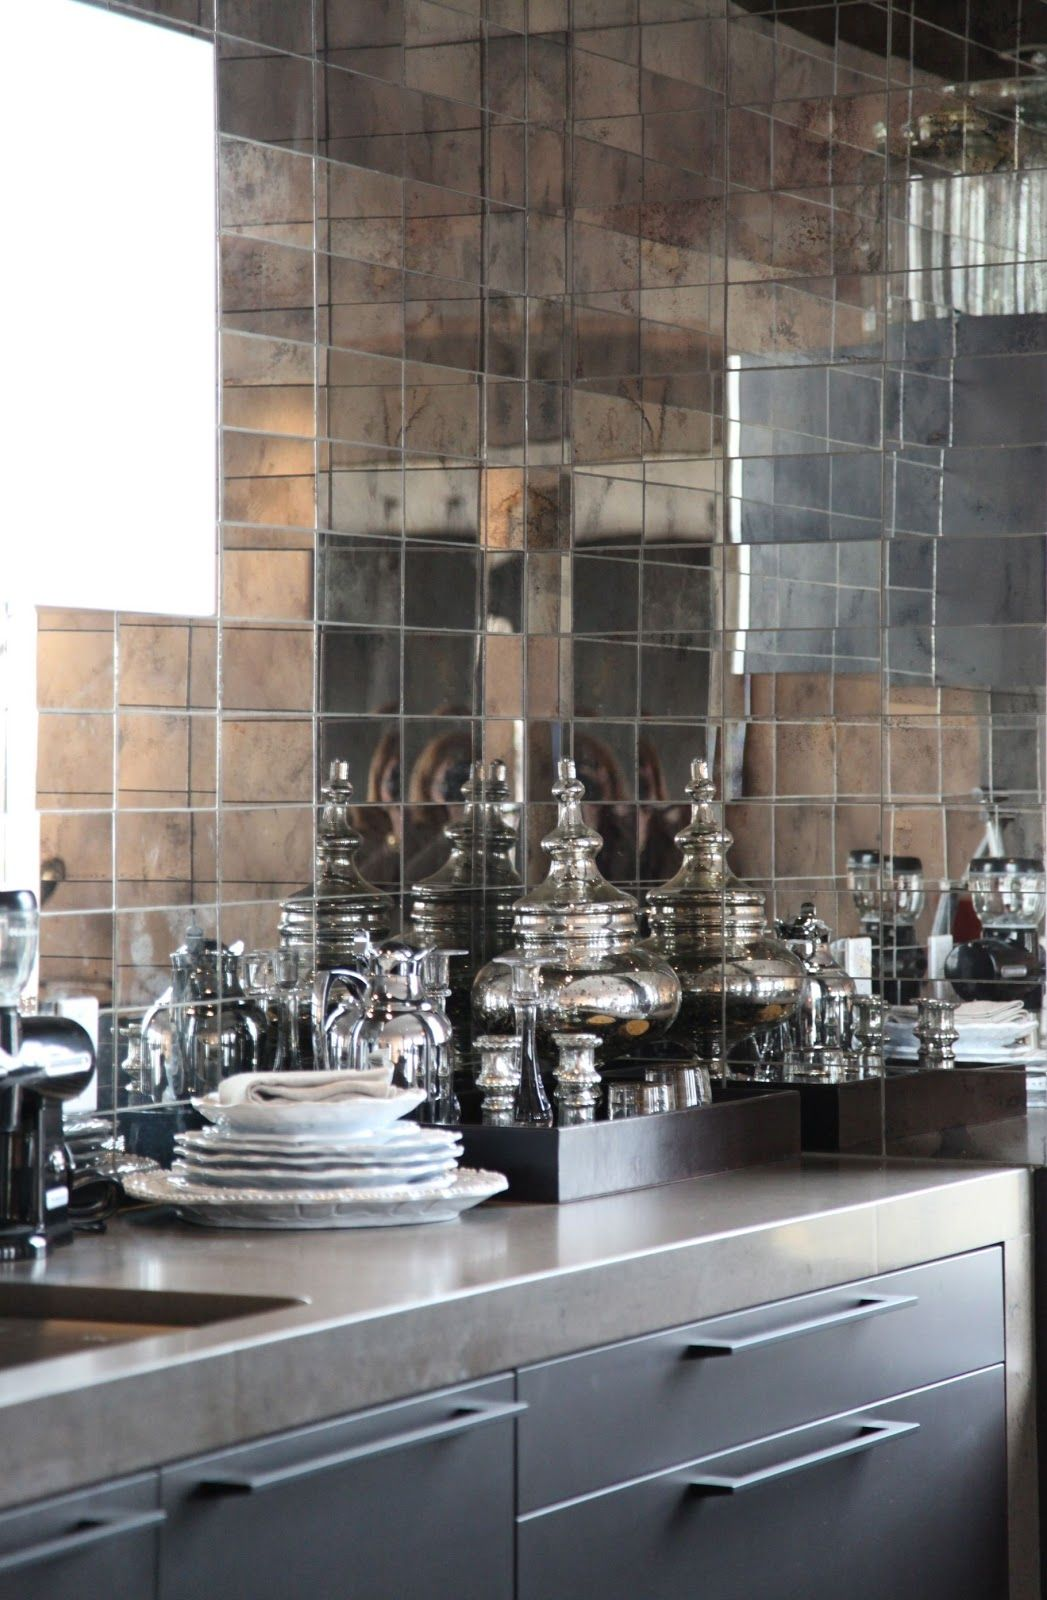 Ann Sacks Mirrored Backsplash For A Wet Bar Basement Wet Bar